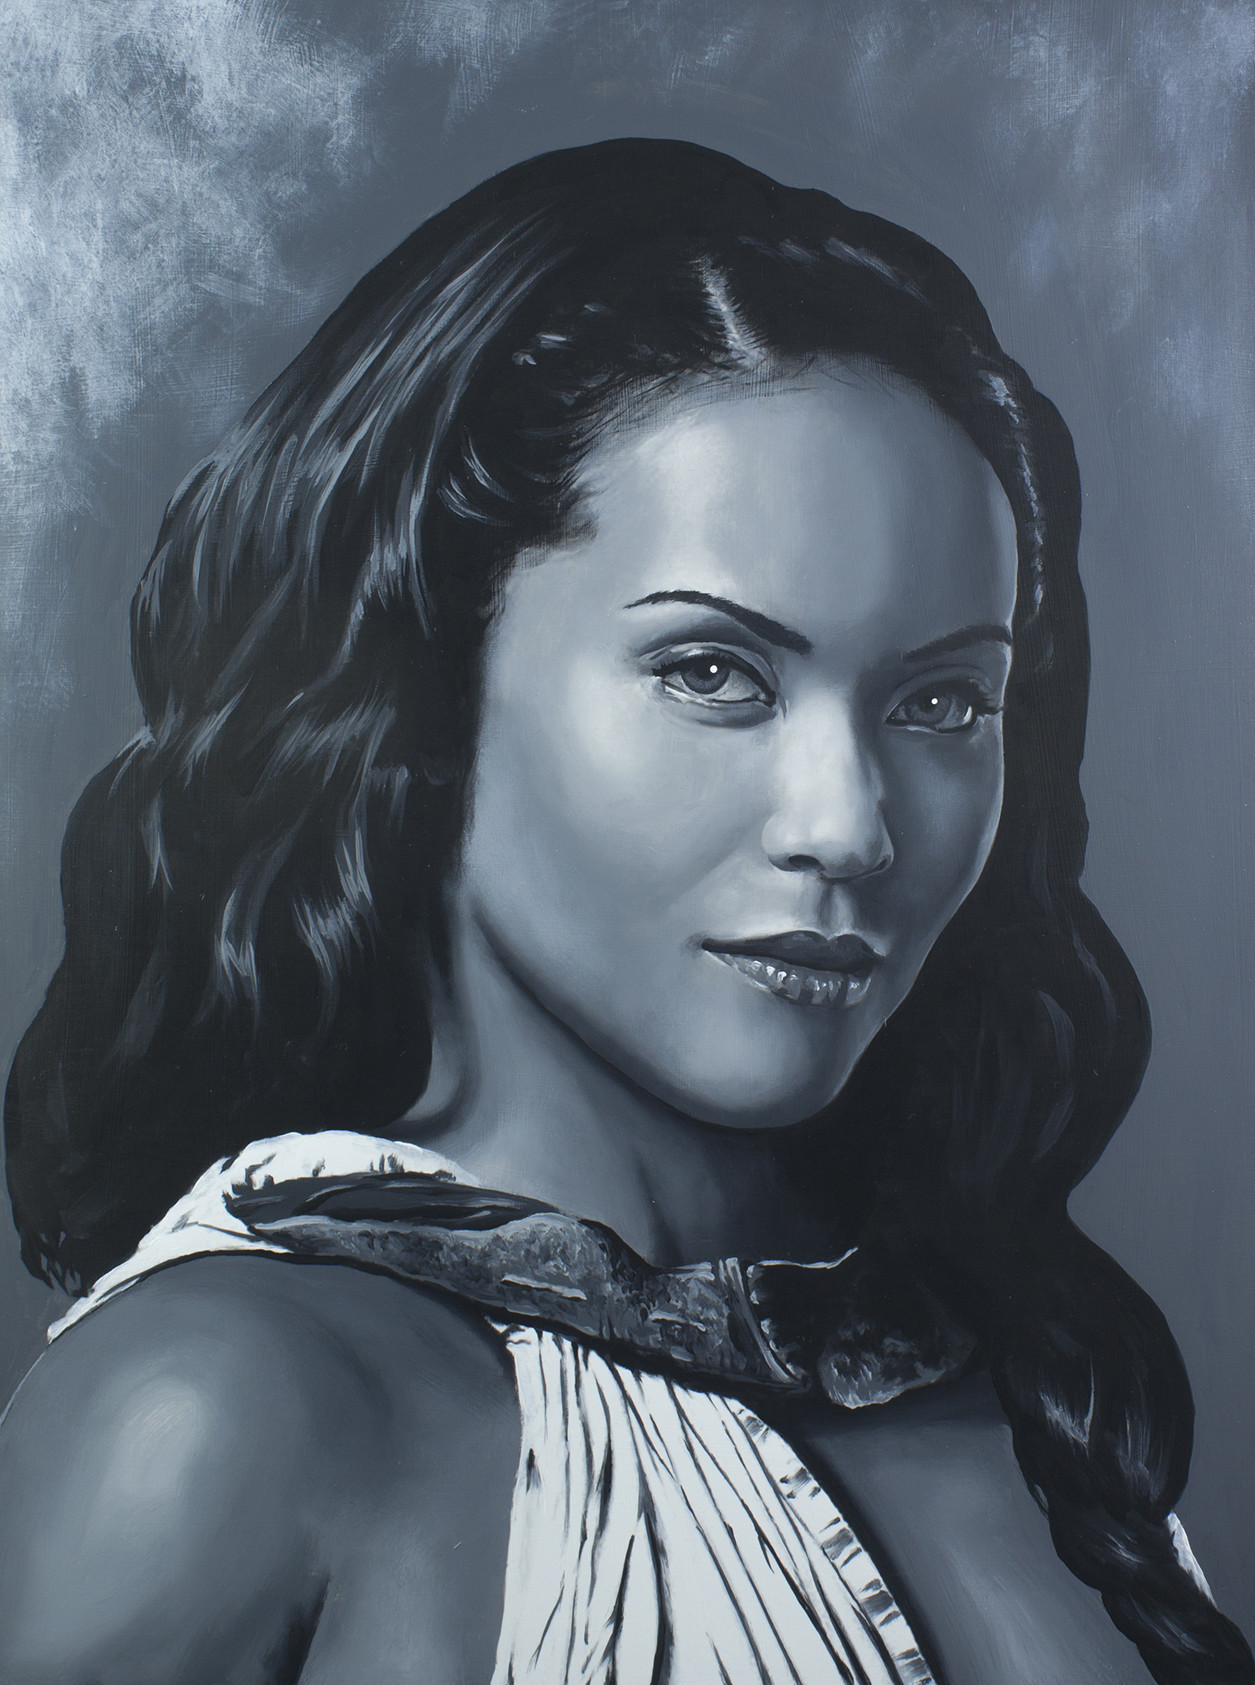 Naevia - Lesley-Ann Brandt Spartacus Series - Acrylic on board. 16x20